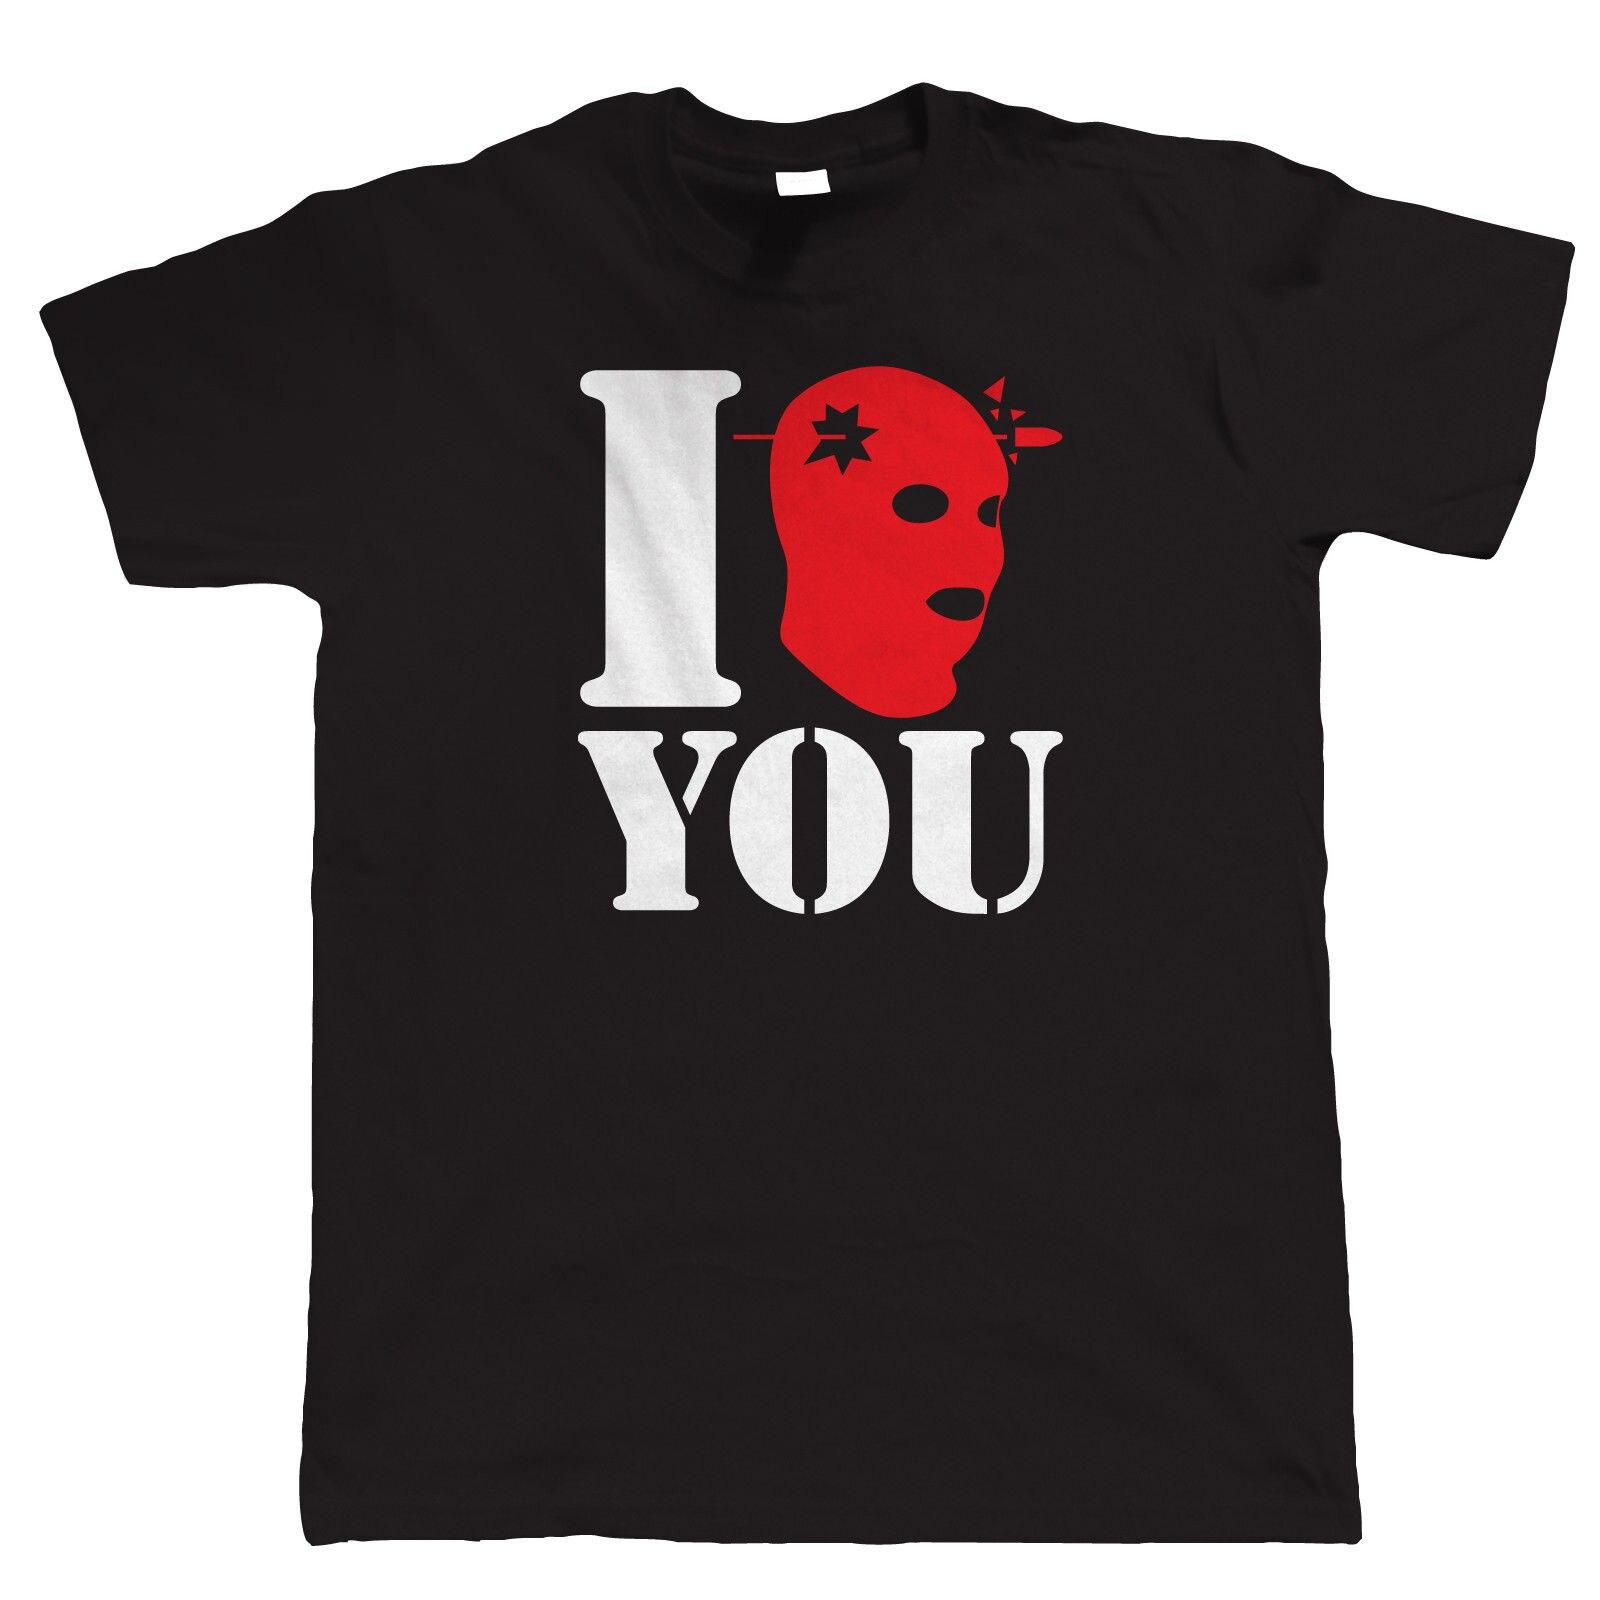 I Headshot You, Mens Gamer T Shirt - Counter Terrorist FPS Video Game Strike